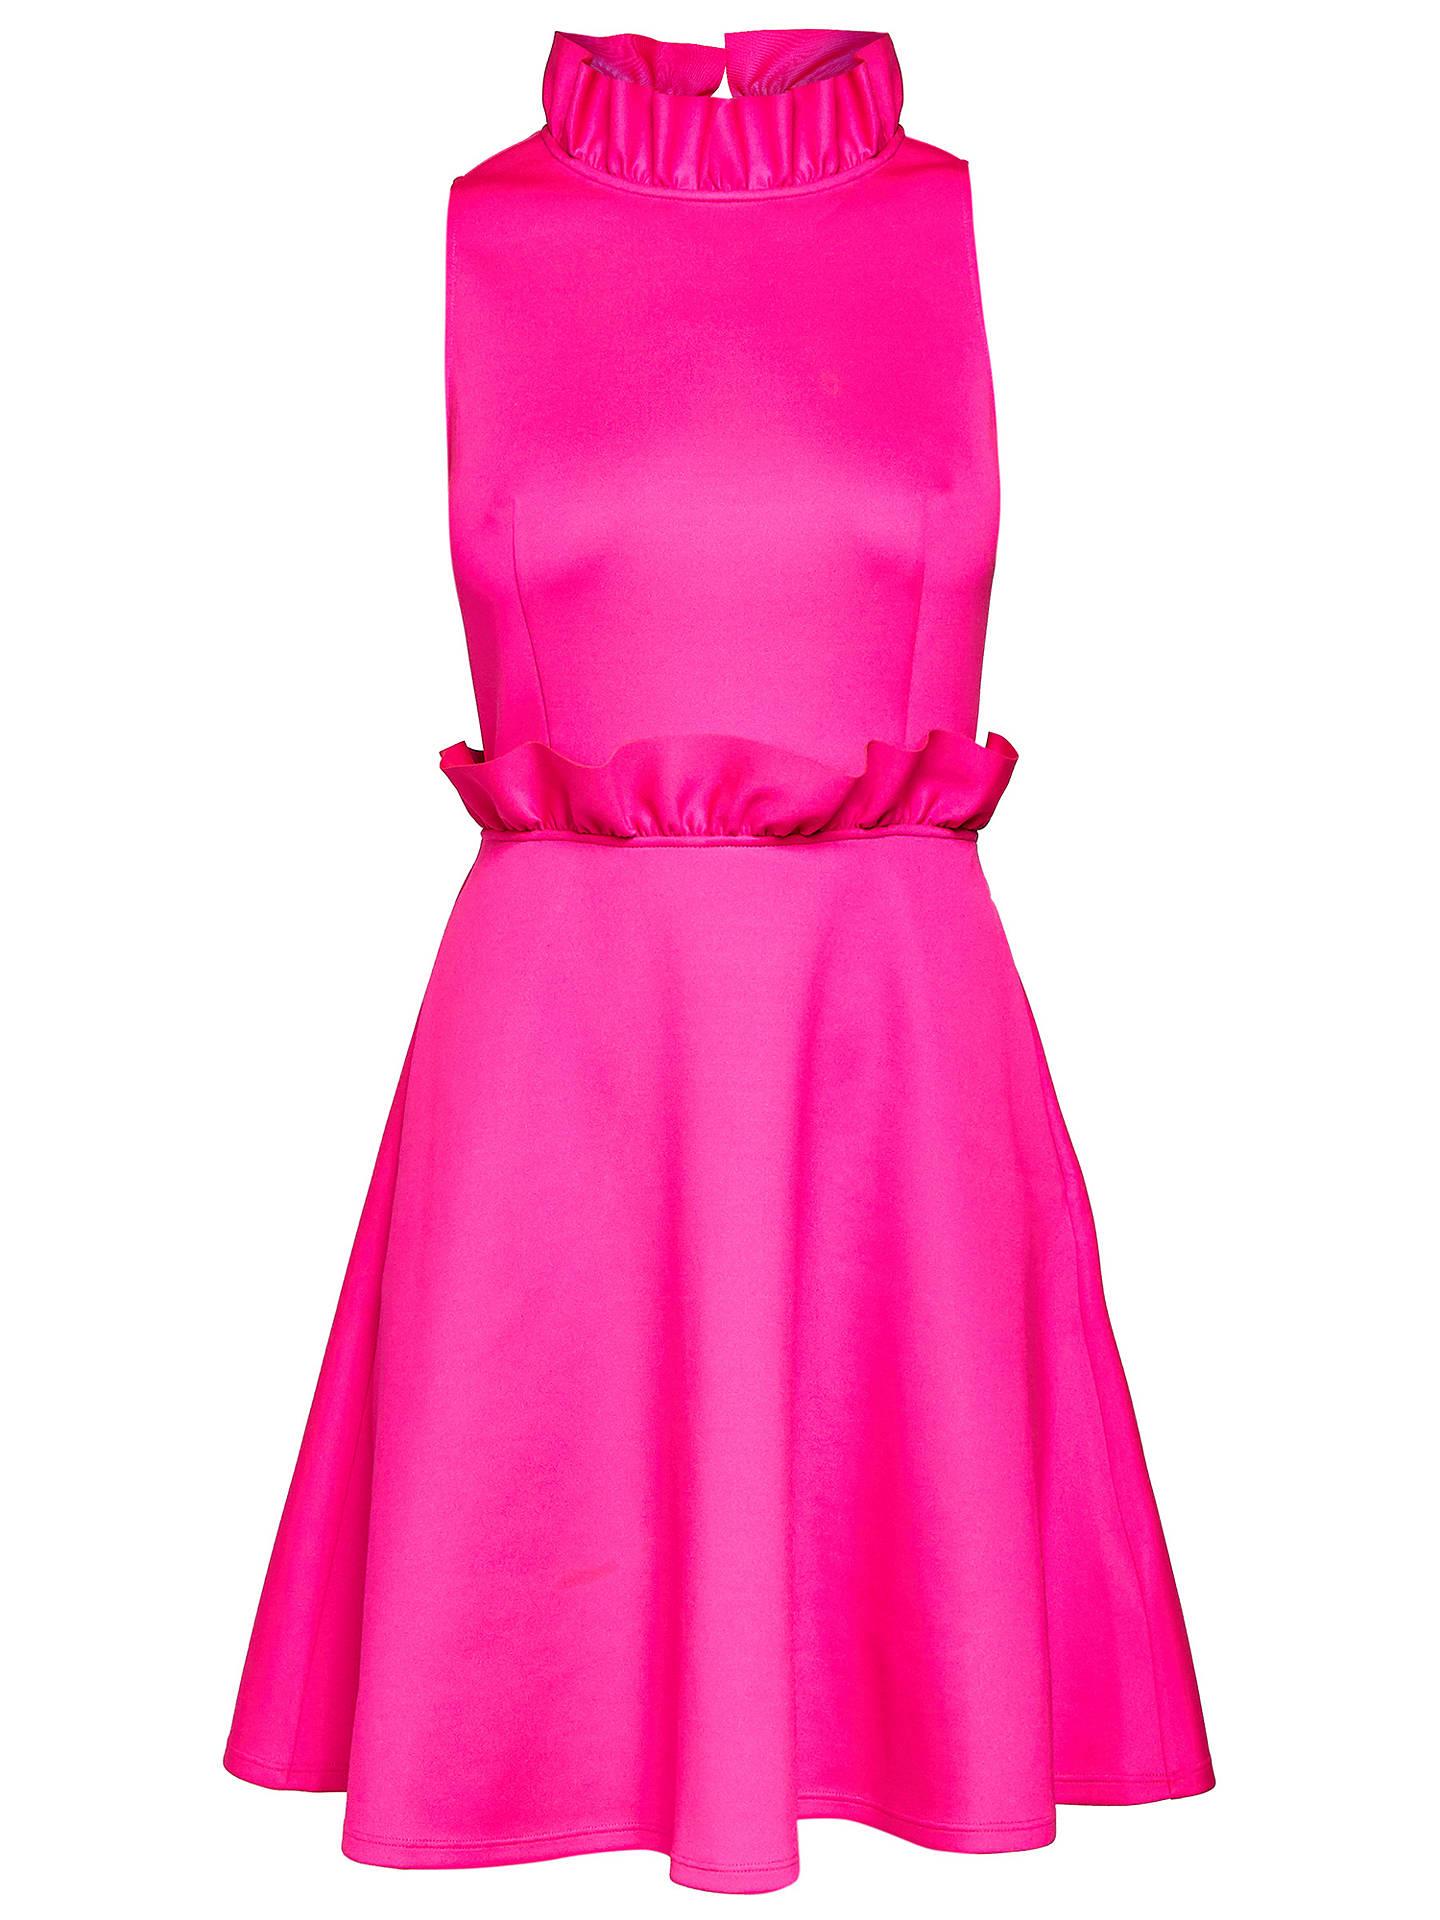 1a6e5487430e33 Buy Ted Baker Janein Ruffle Waist Dress